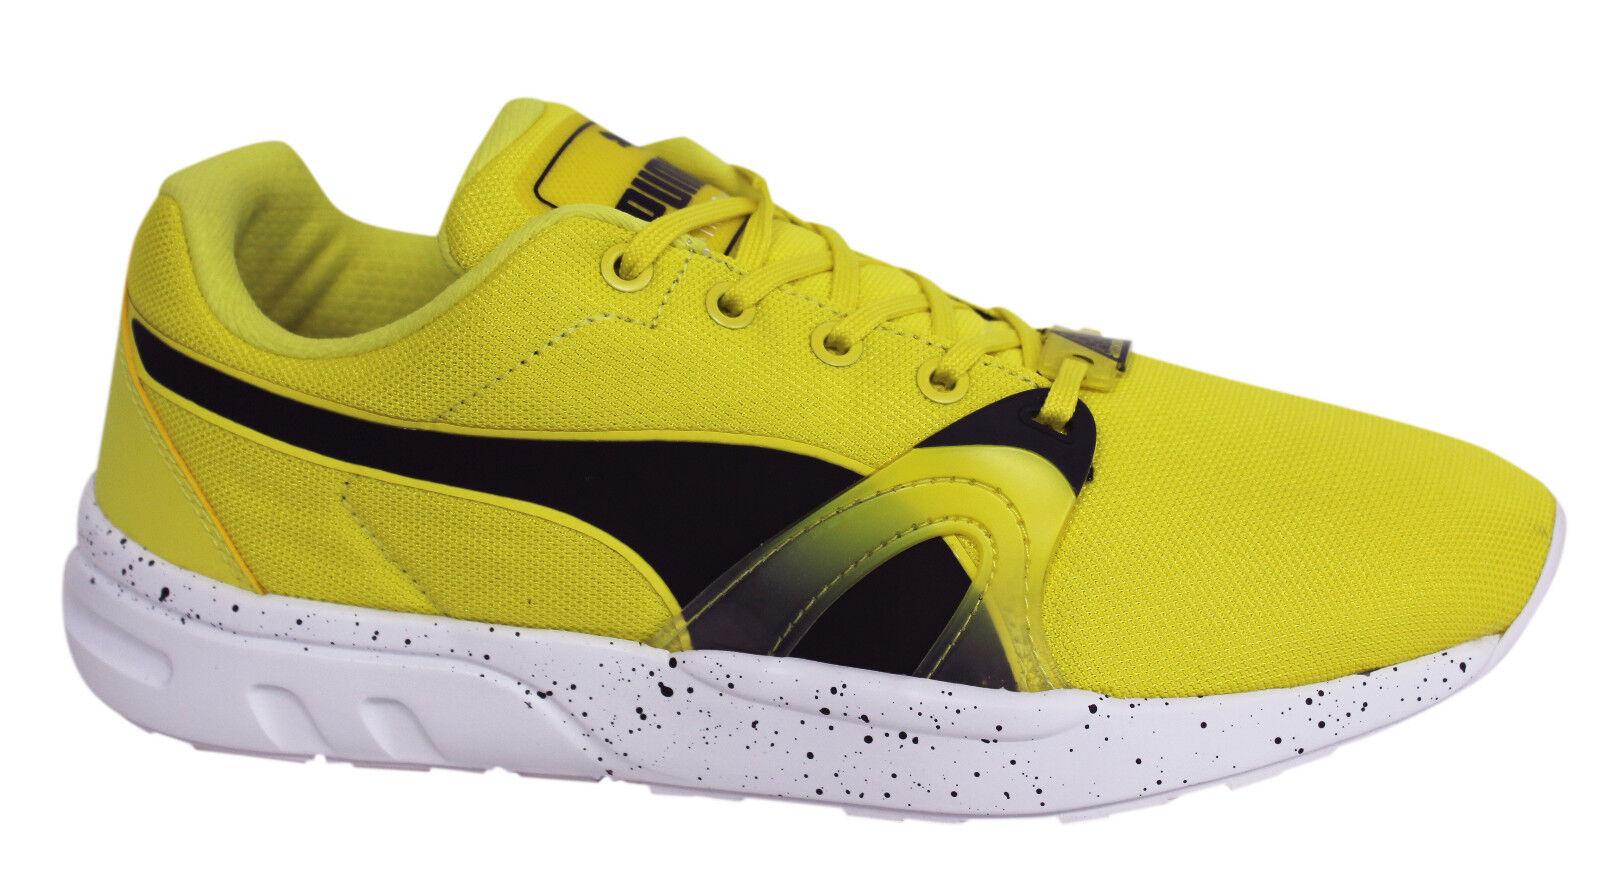 Puma trinomic XT S hombre amarillo cordon formadores 02 zapatos para correr 359872 02 formadores D29 6ac9f8